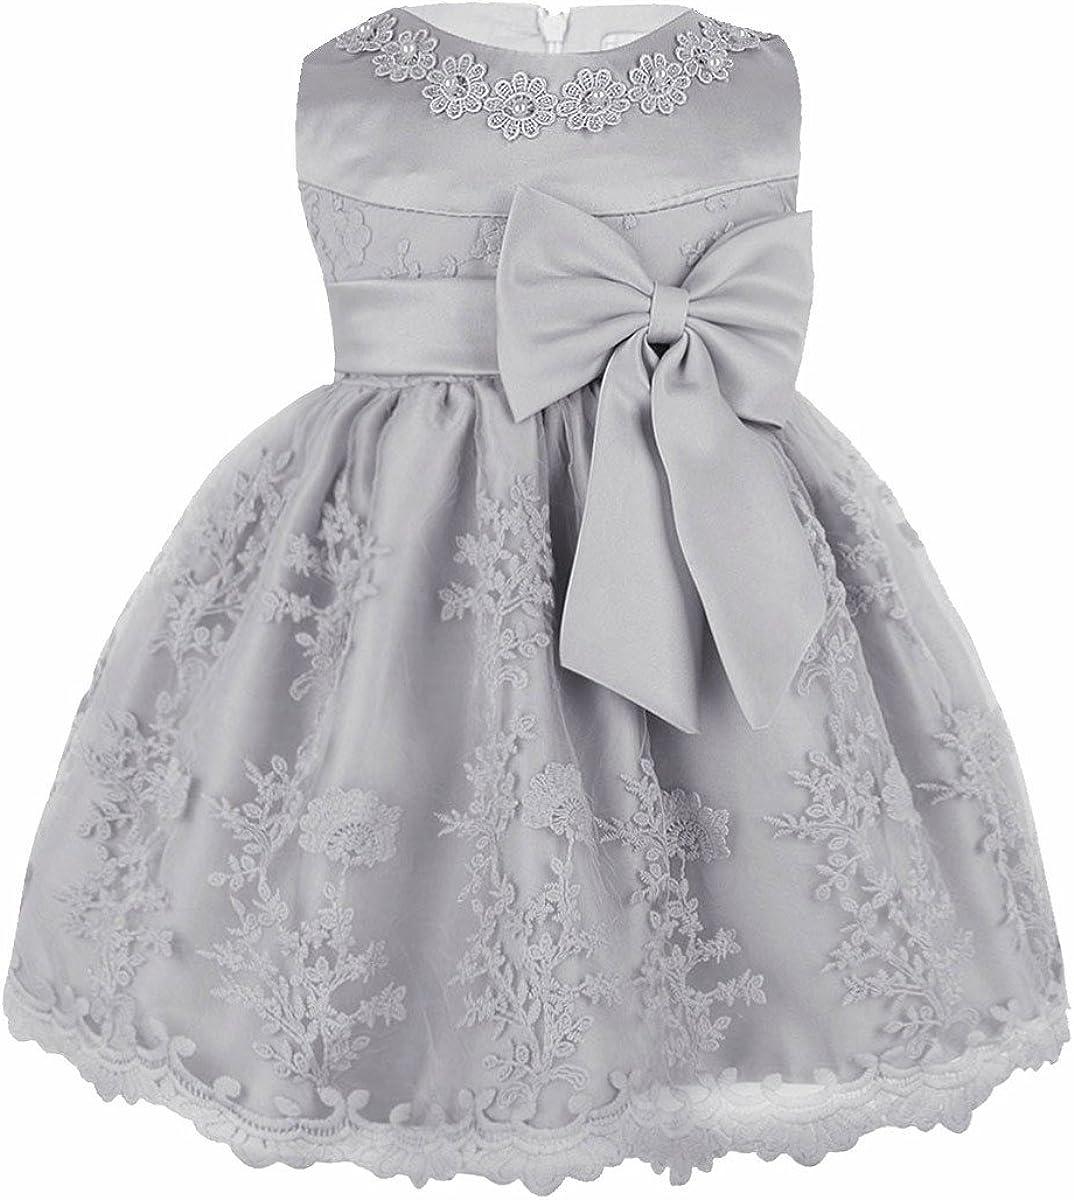 iiniim Baby Girls Princess Rose Flower Bow Dress